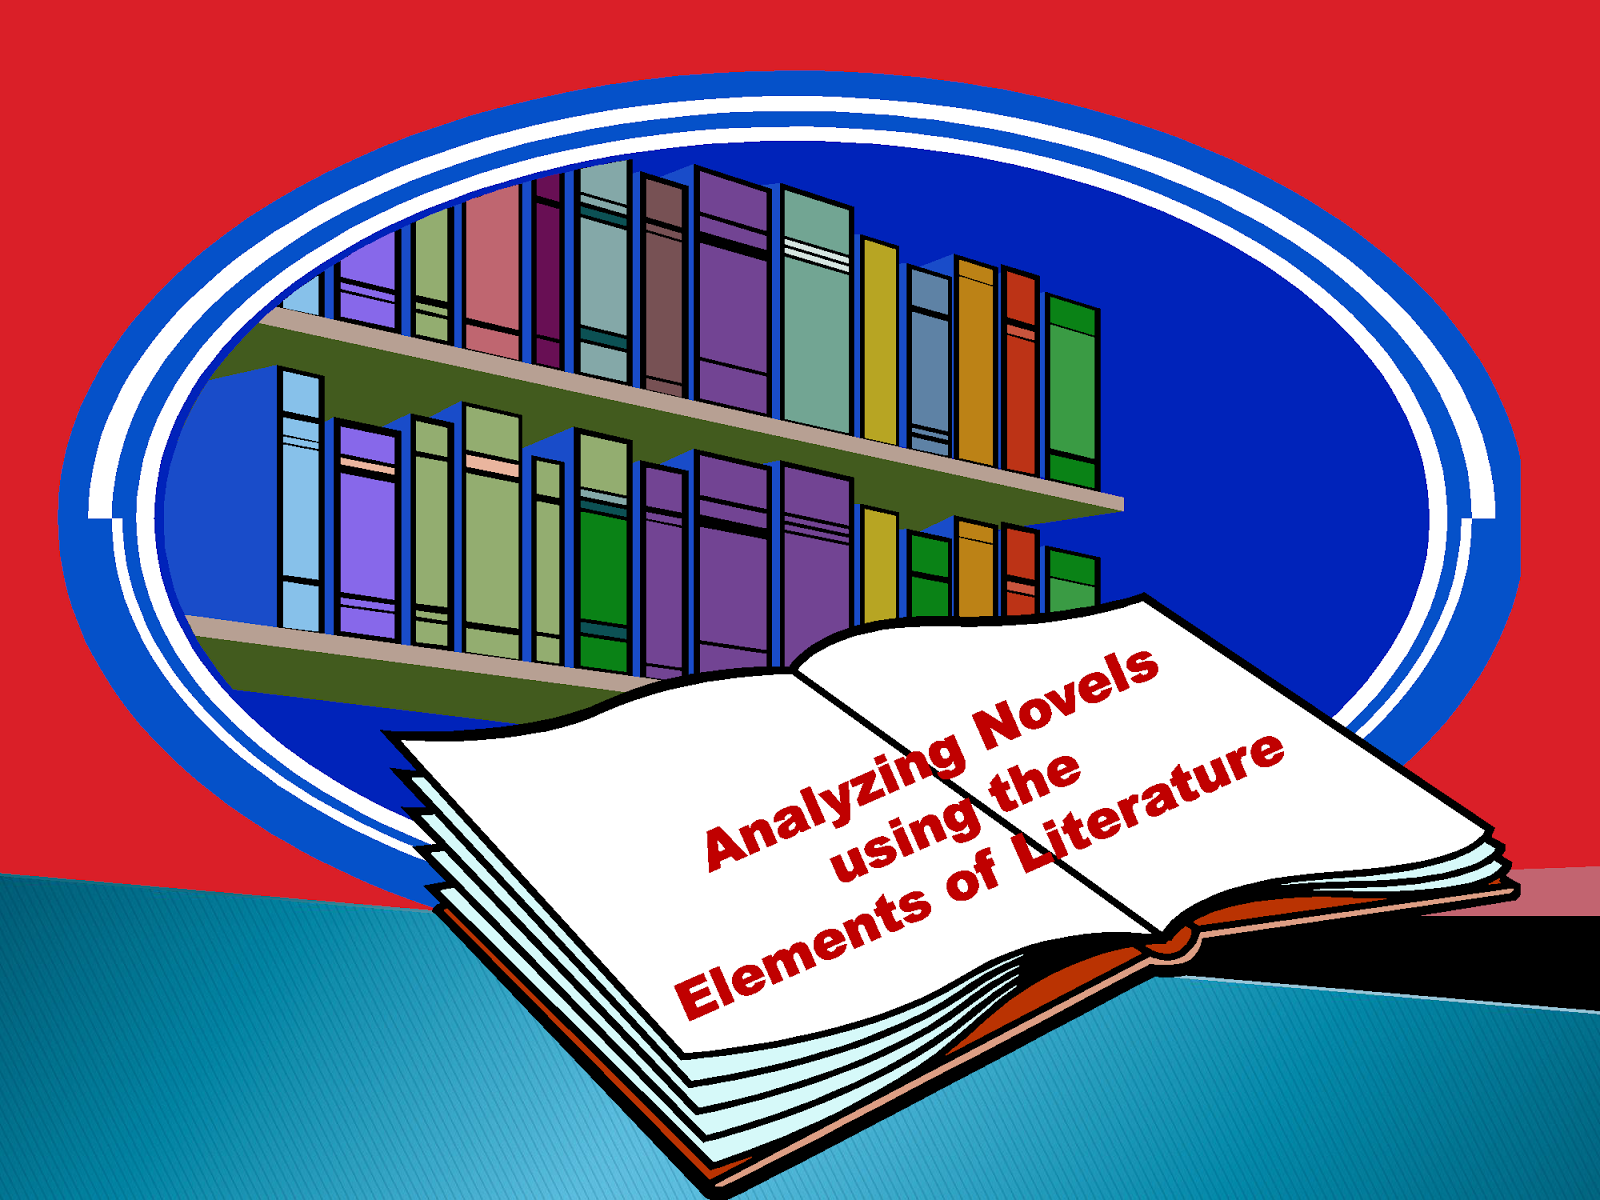 Elemental clipart literary analysis Writing essay Writing literary writing